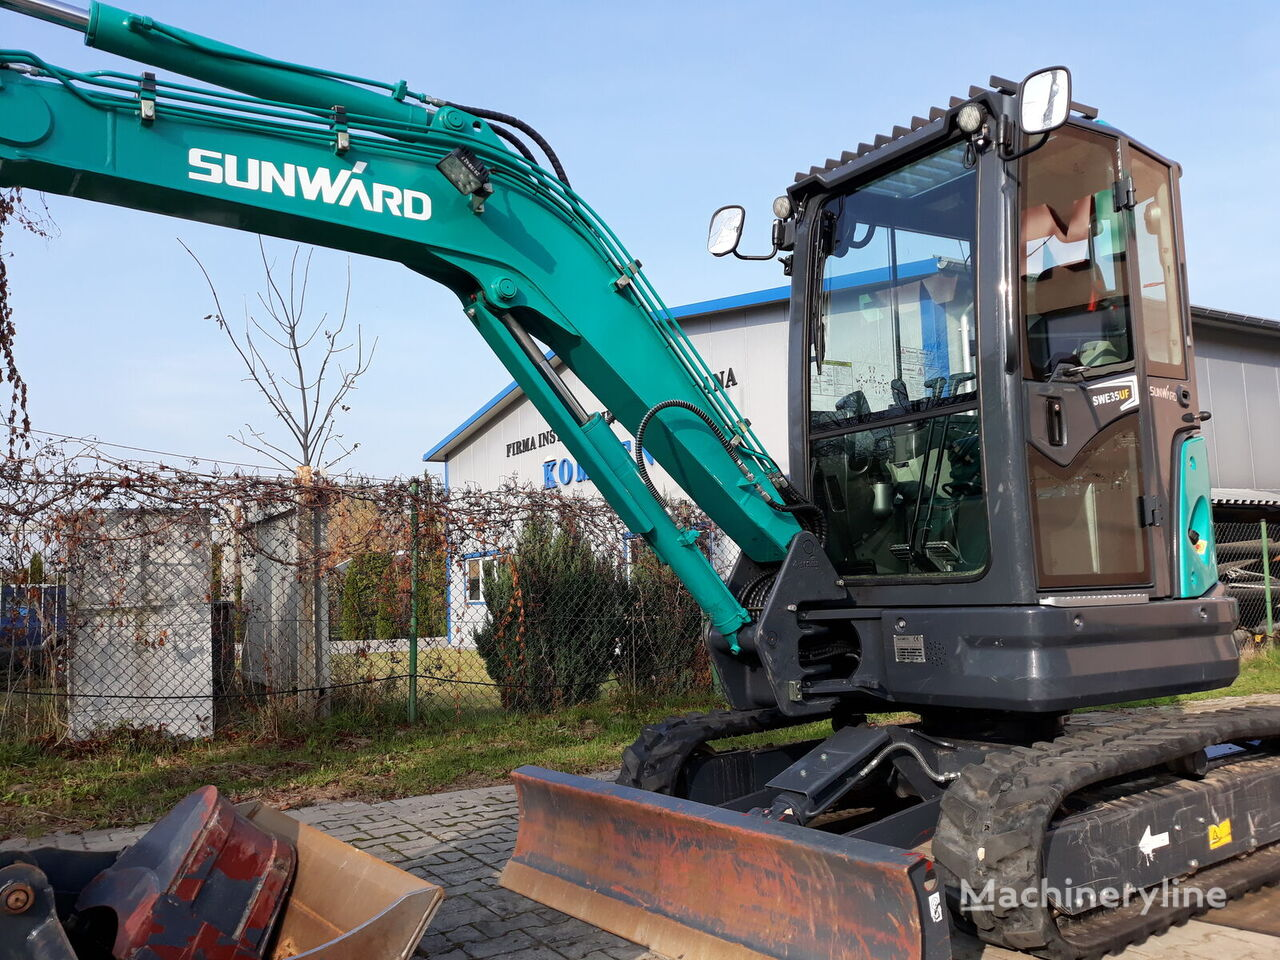 SUNWARD SWE 35UF mini excavator